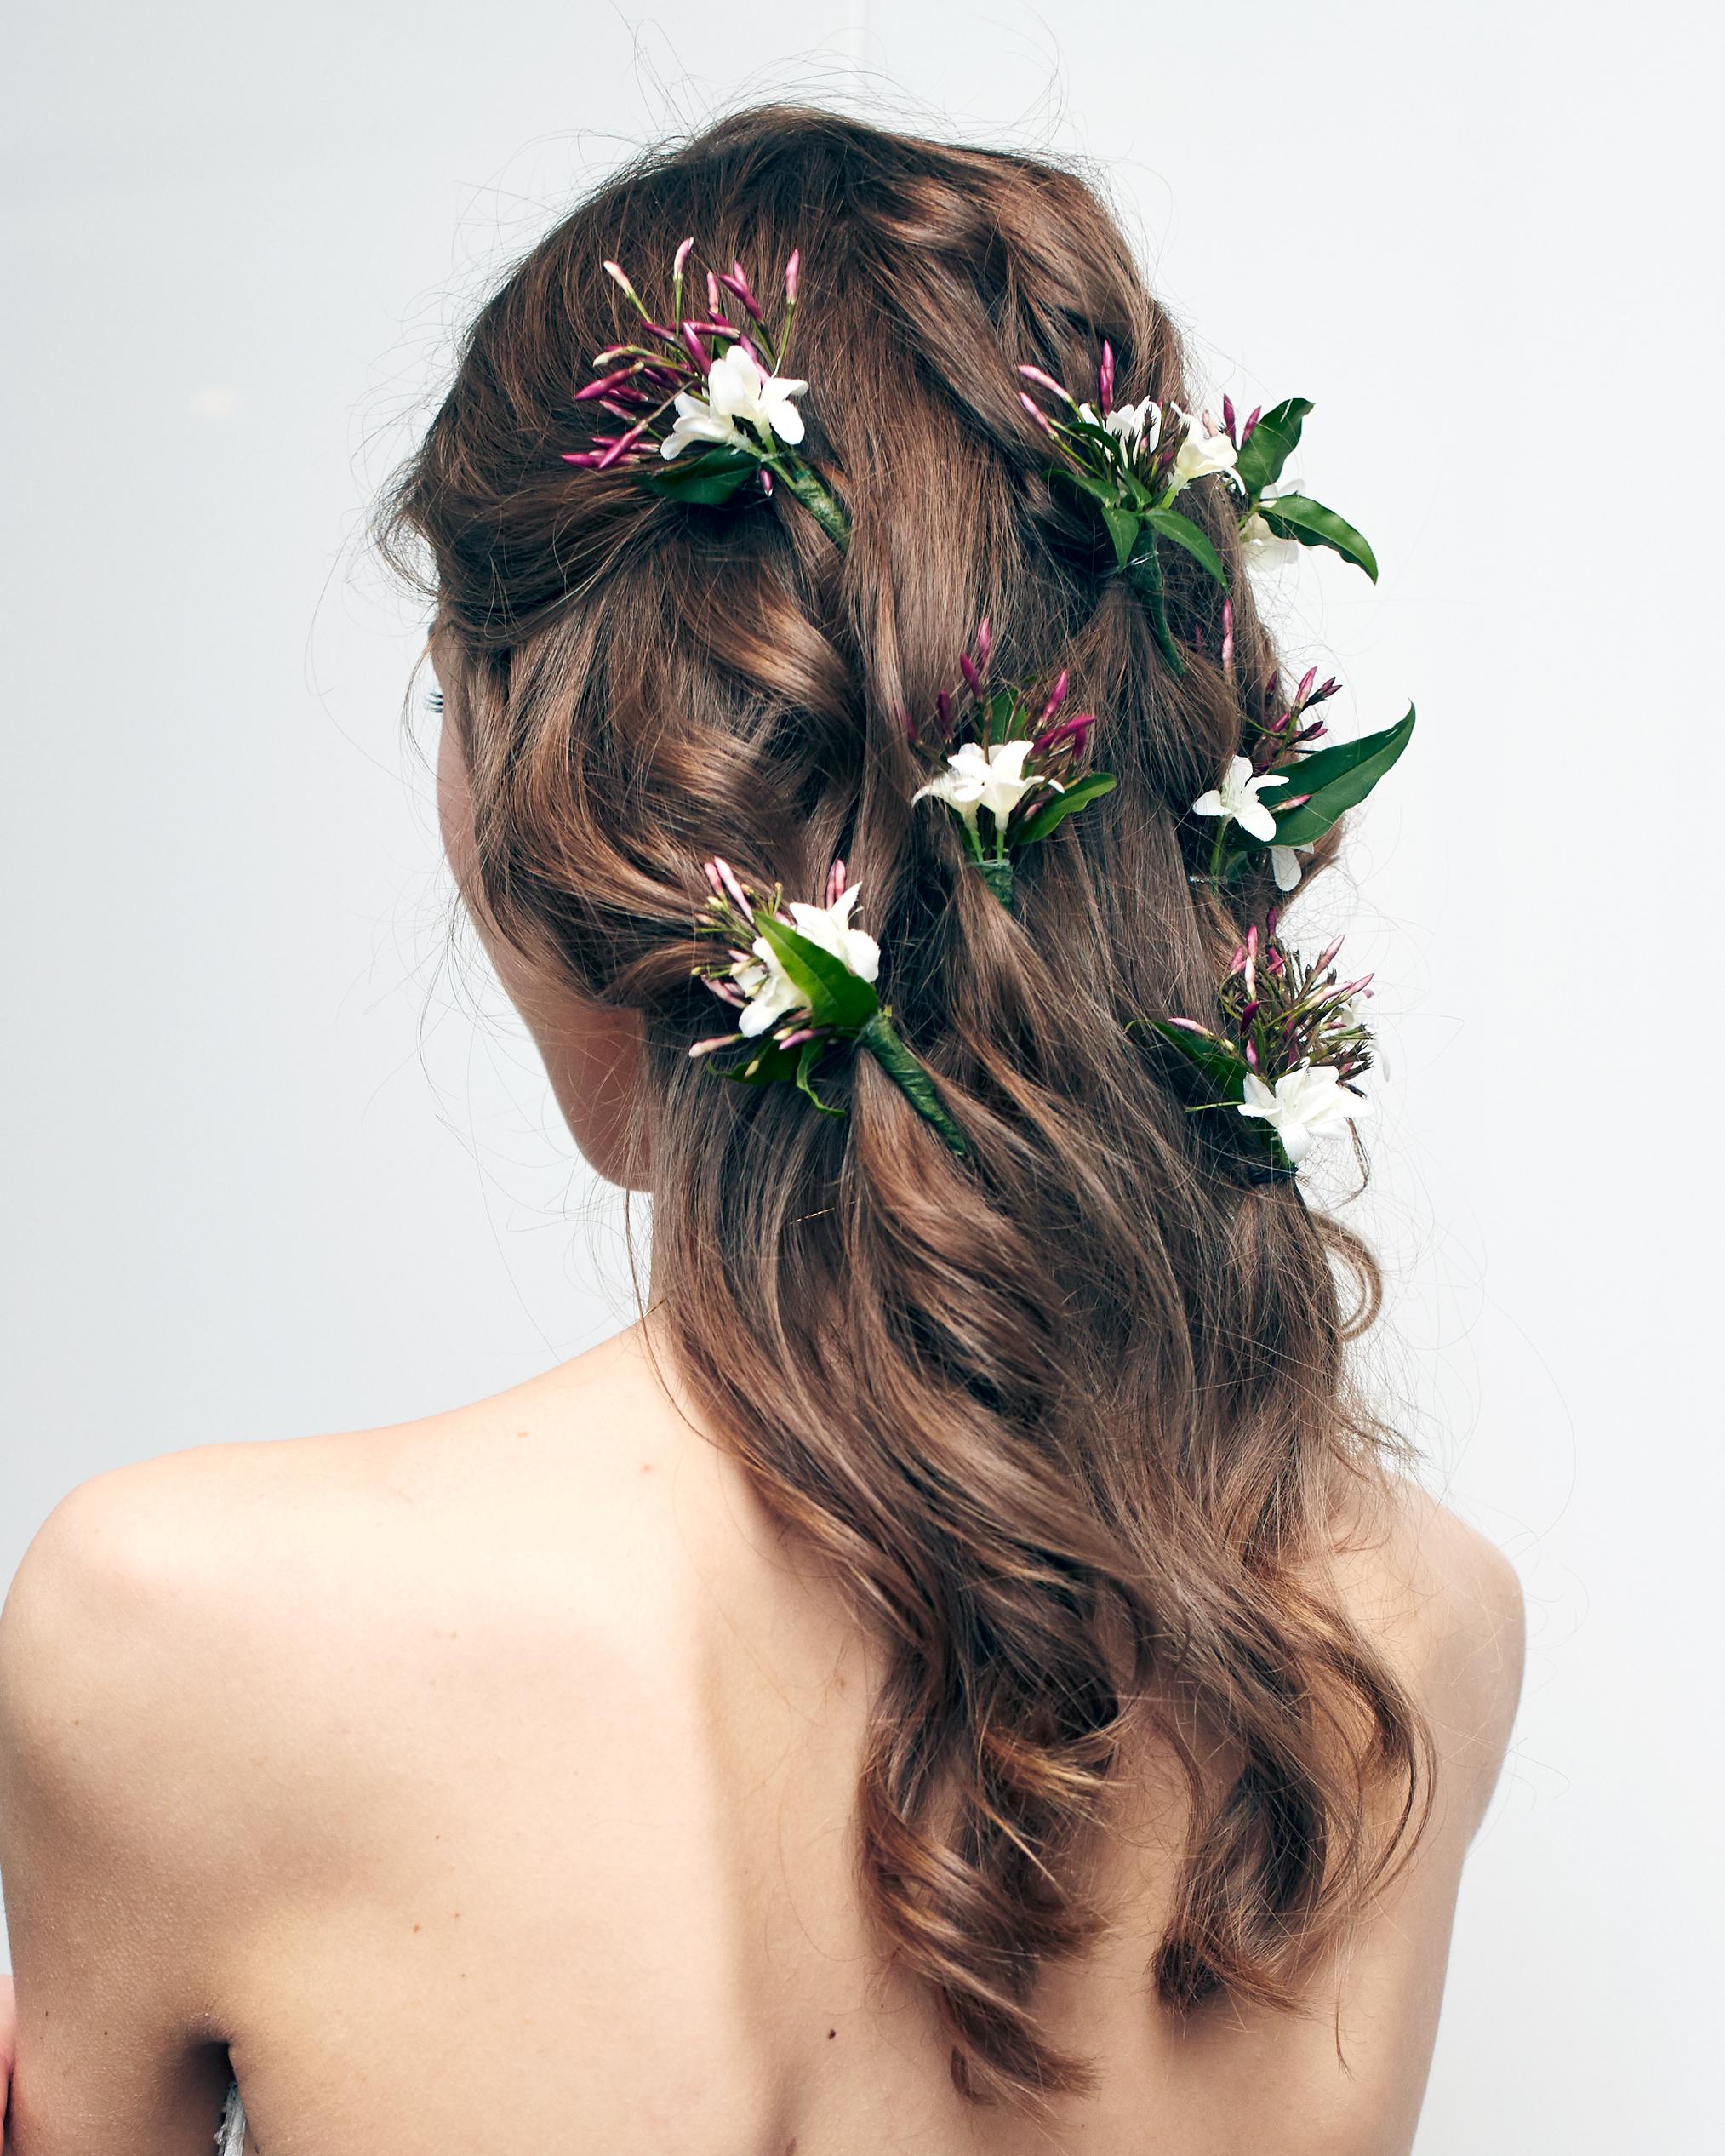 textured-hair-carolina-herrera-spring2016-bridal-show-detail-0515.jpg